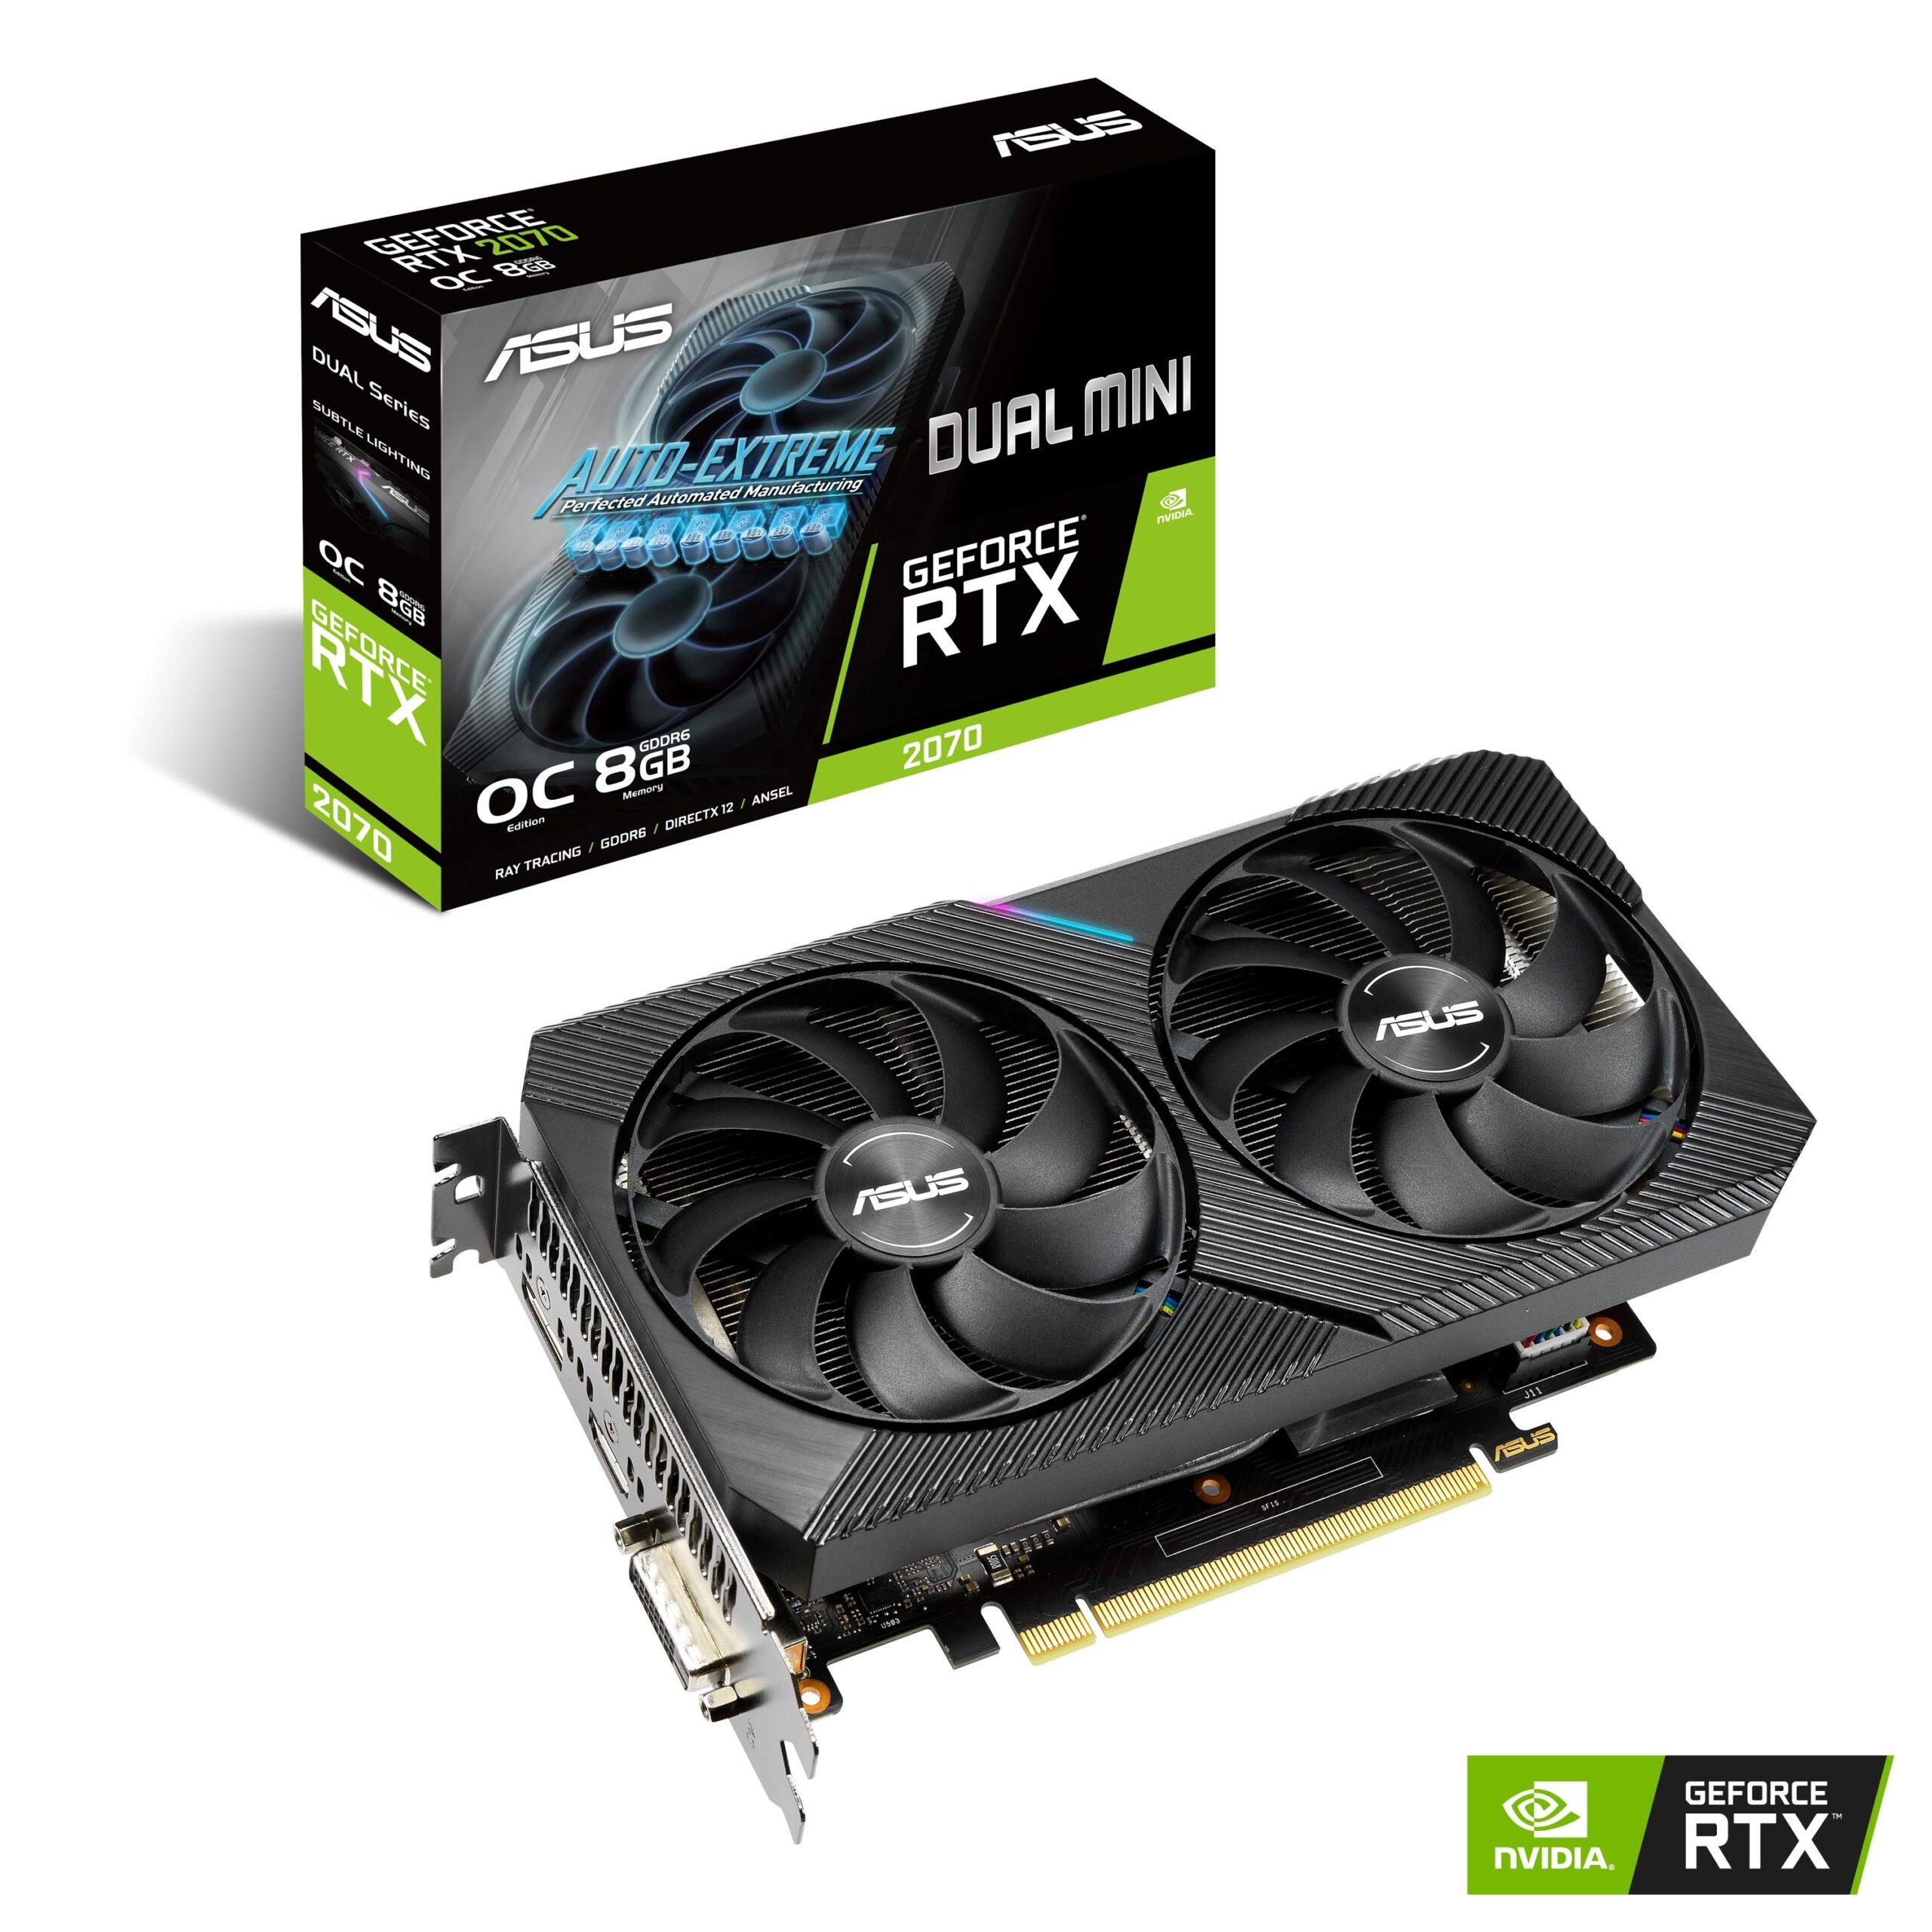 ASUS представила видеокарту Dual GeForce RTX 2070 MINI